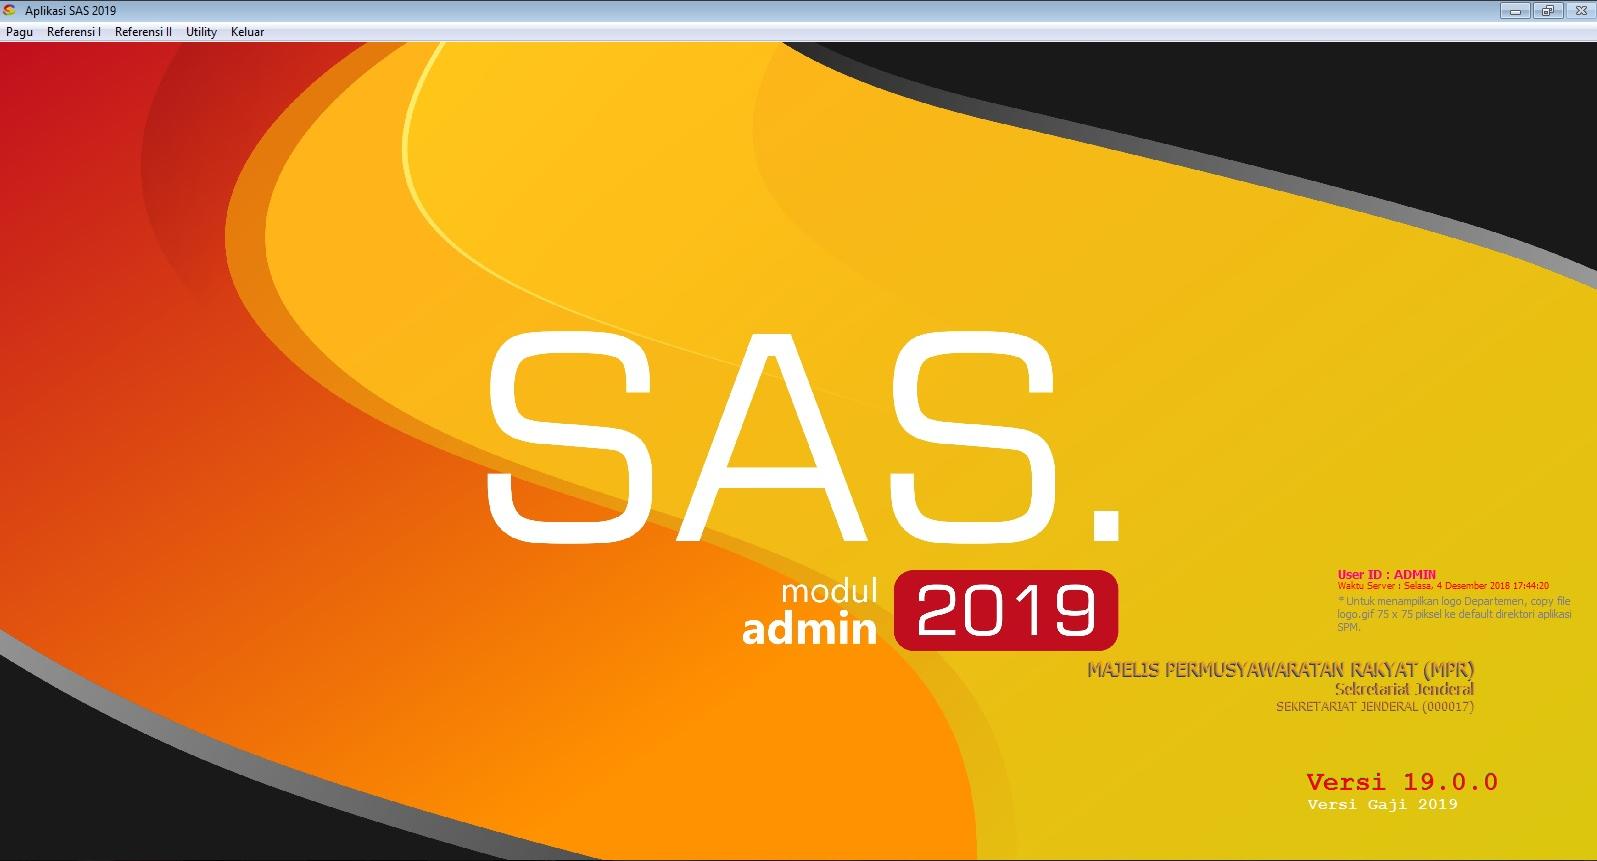 Sahabat Satker: Instalasi Aplikasi SAS 2019